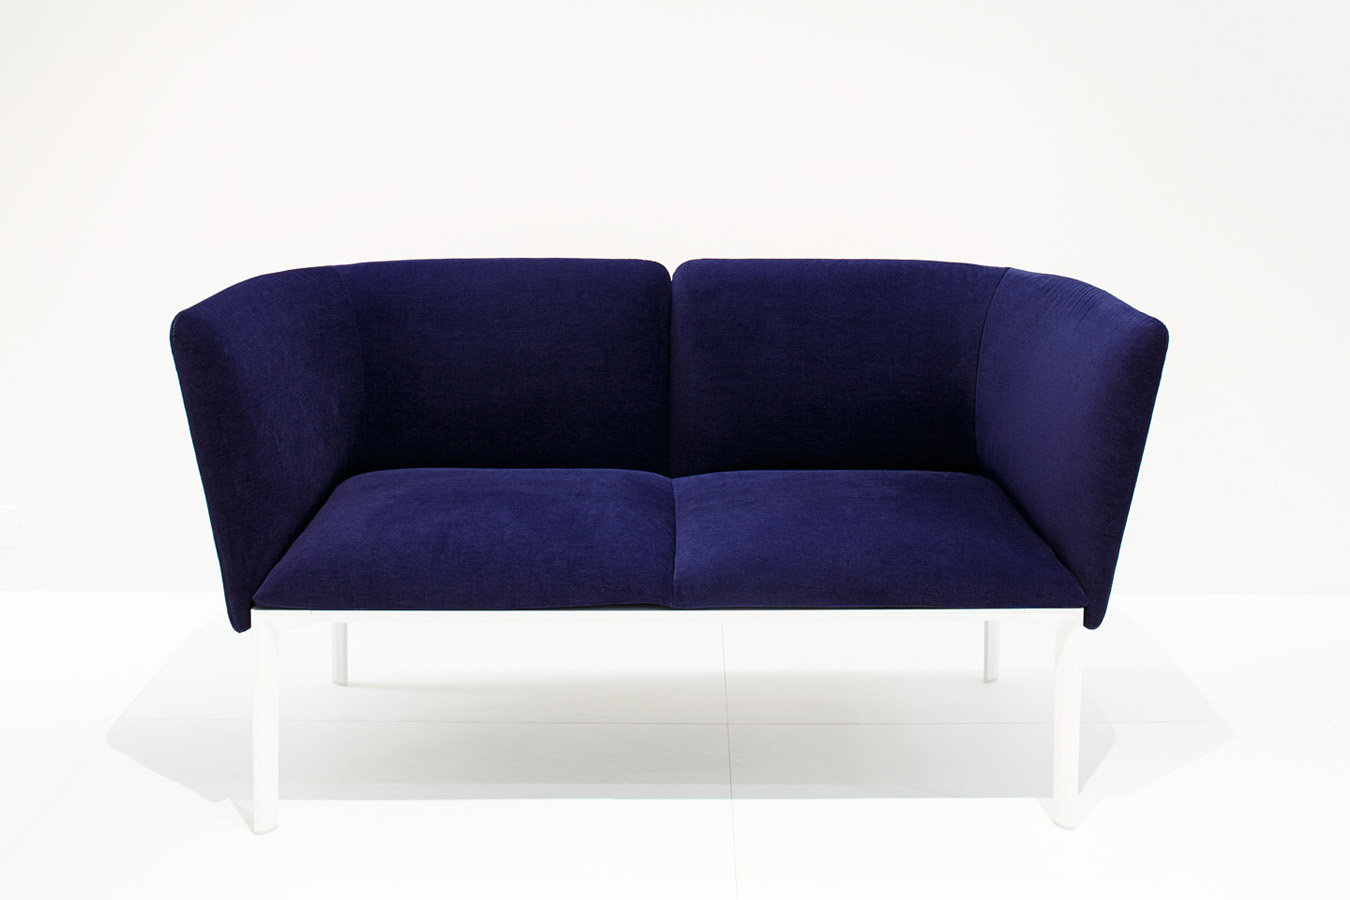 sofá azul océano lapalma muebles mallorca